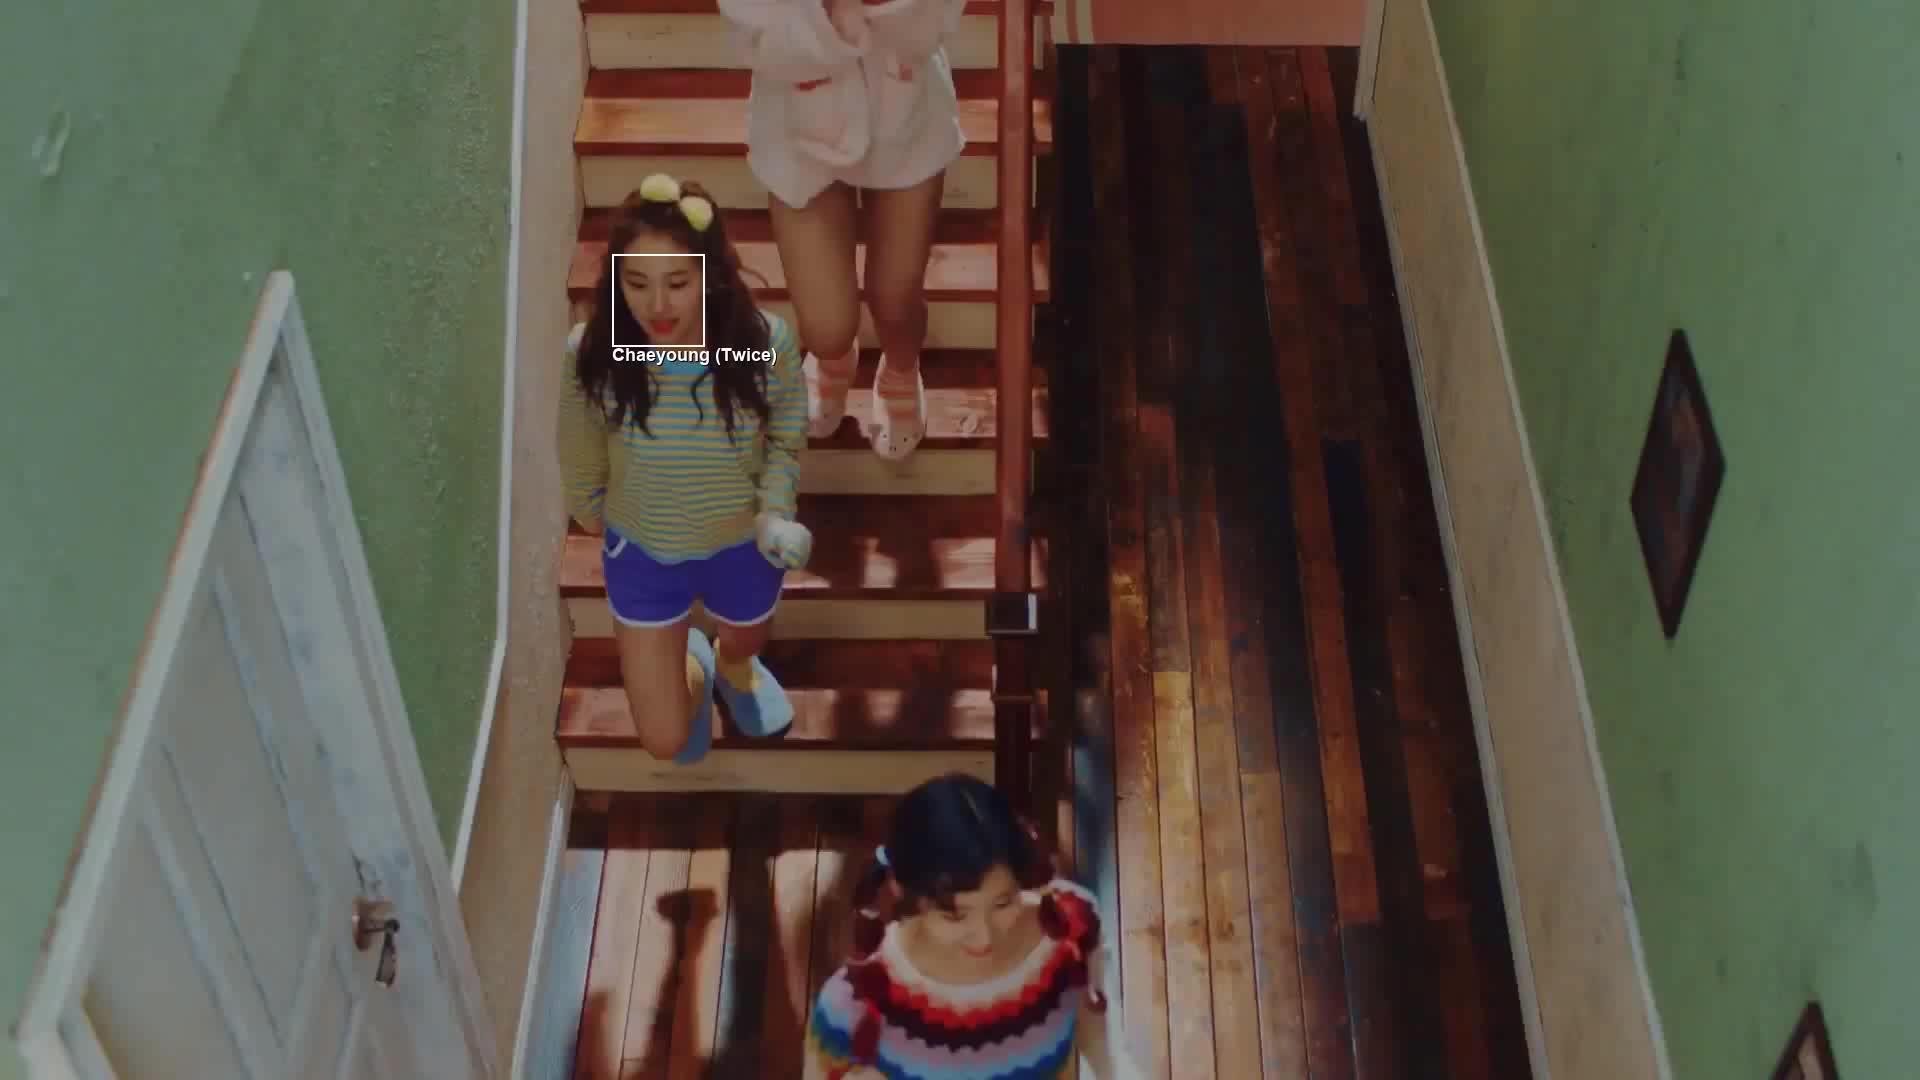 chaeyoung, jihyo, kpop, nayeon, twice, Gfycat - Project Maru GIFs